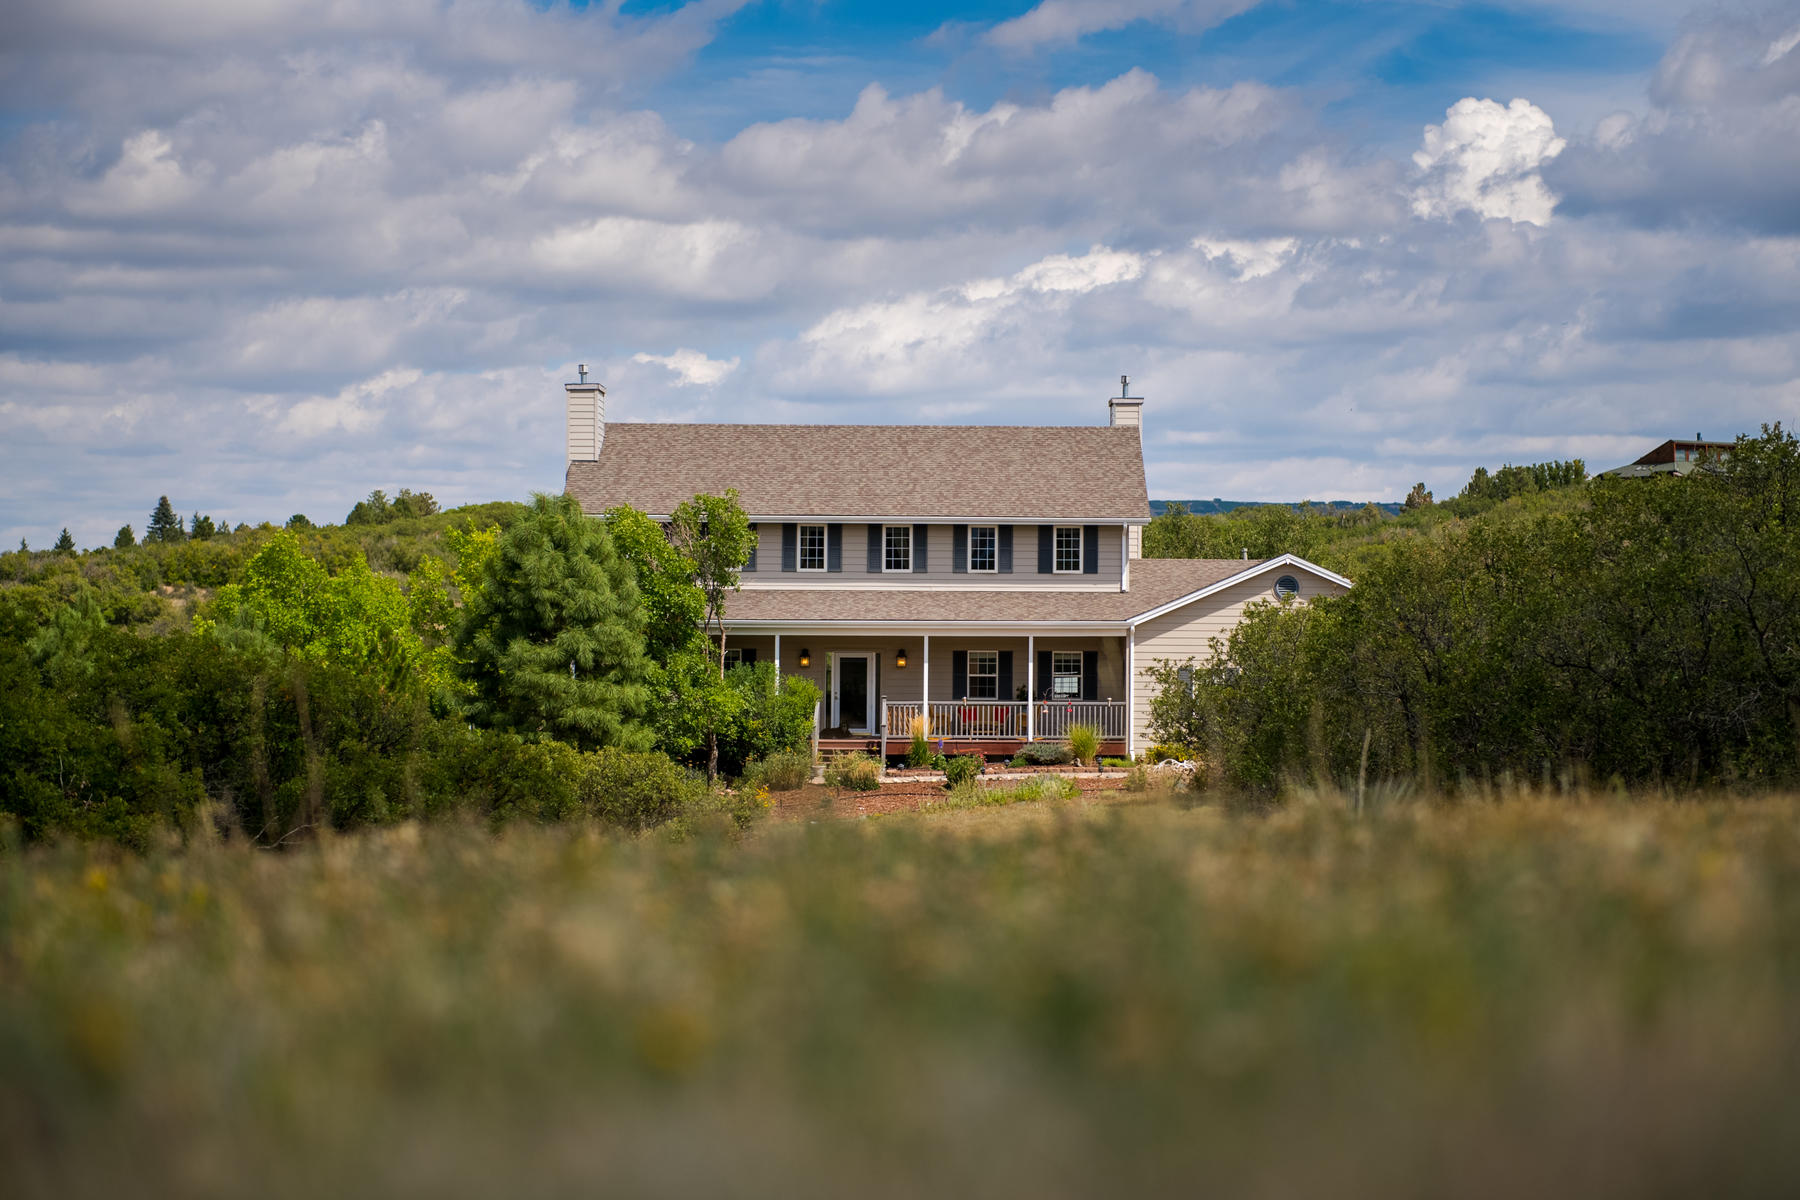 Single Family Home for Active at Come home to beautiful Sedalia! 3997 Christy Ridge Rd Sedalia, Colorado 80135 United States